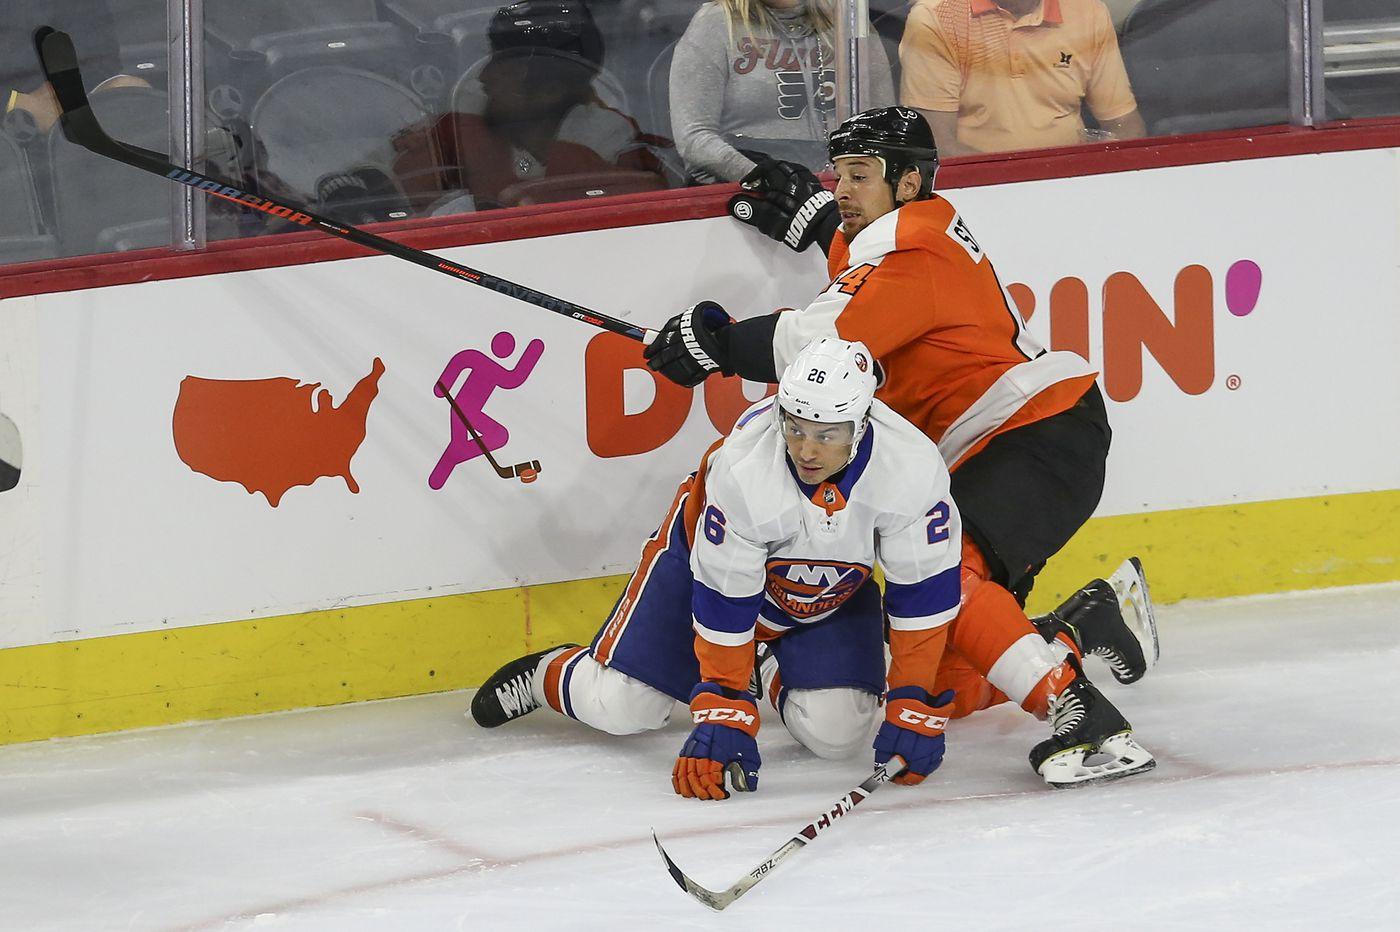 Flyers fall to Islanders, 3-1, in teams' exhibition opener